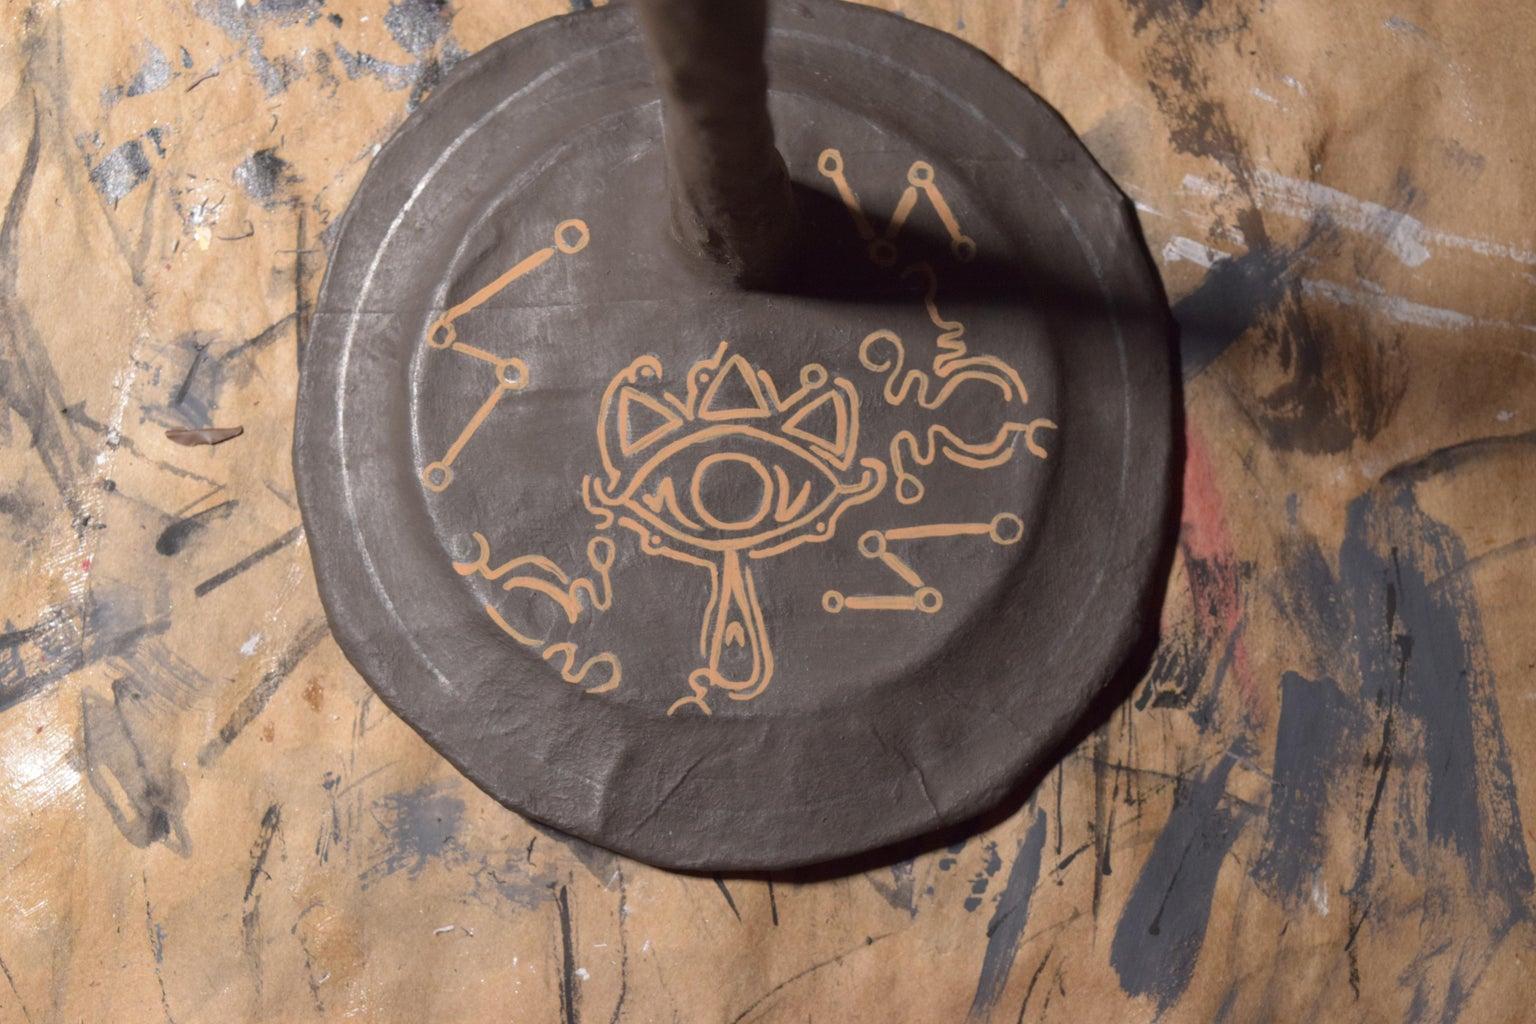 Creating a Figure Stand - Painting (Sheikah Eye + Swirls)